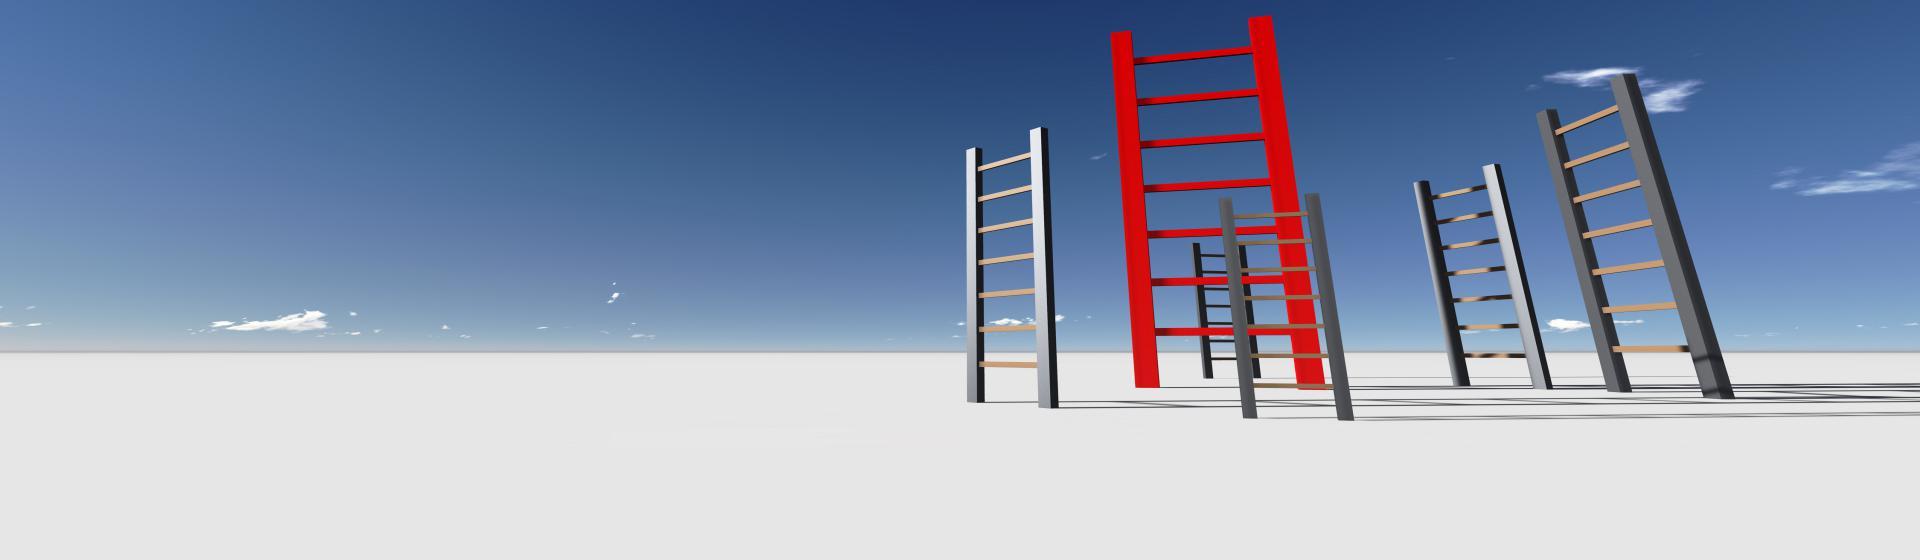 Ladder of success myih4  d